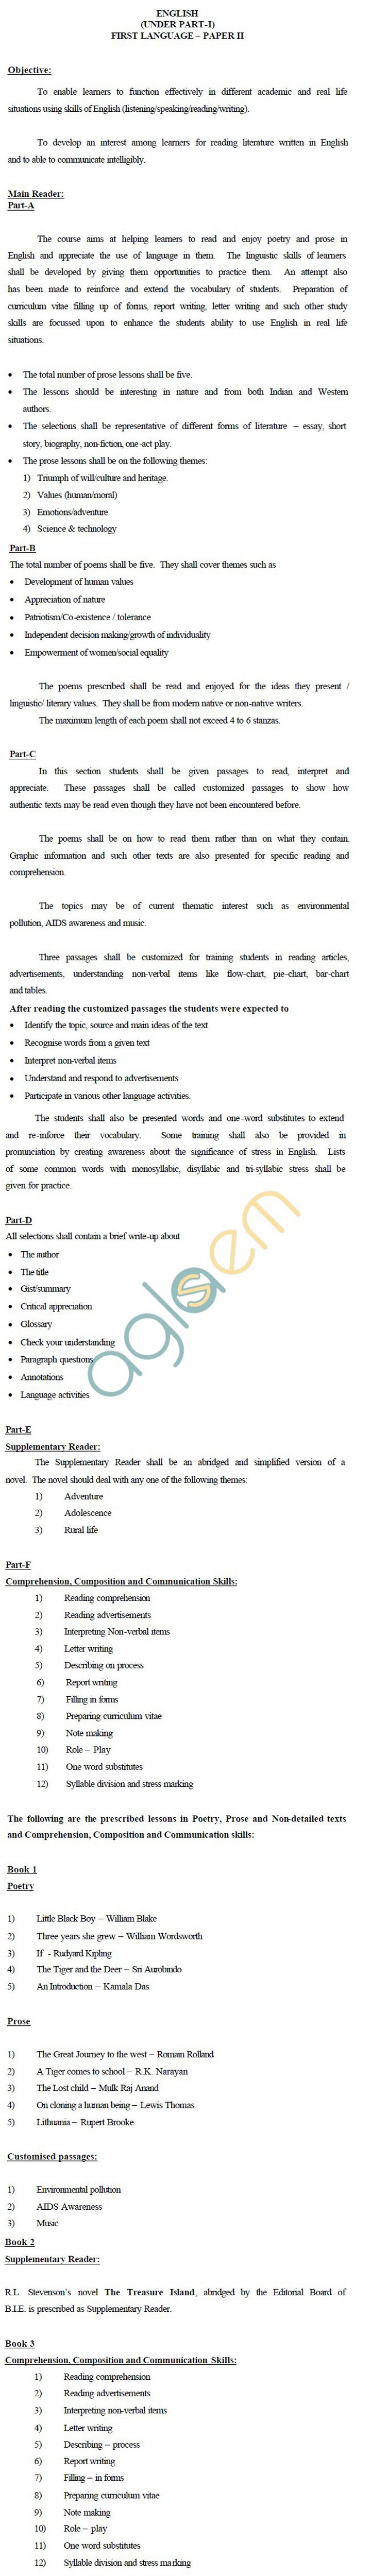 AP Board Intermediate II Year English Grammer Model Question Paper